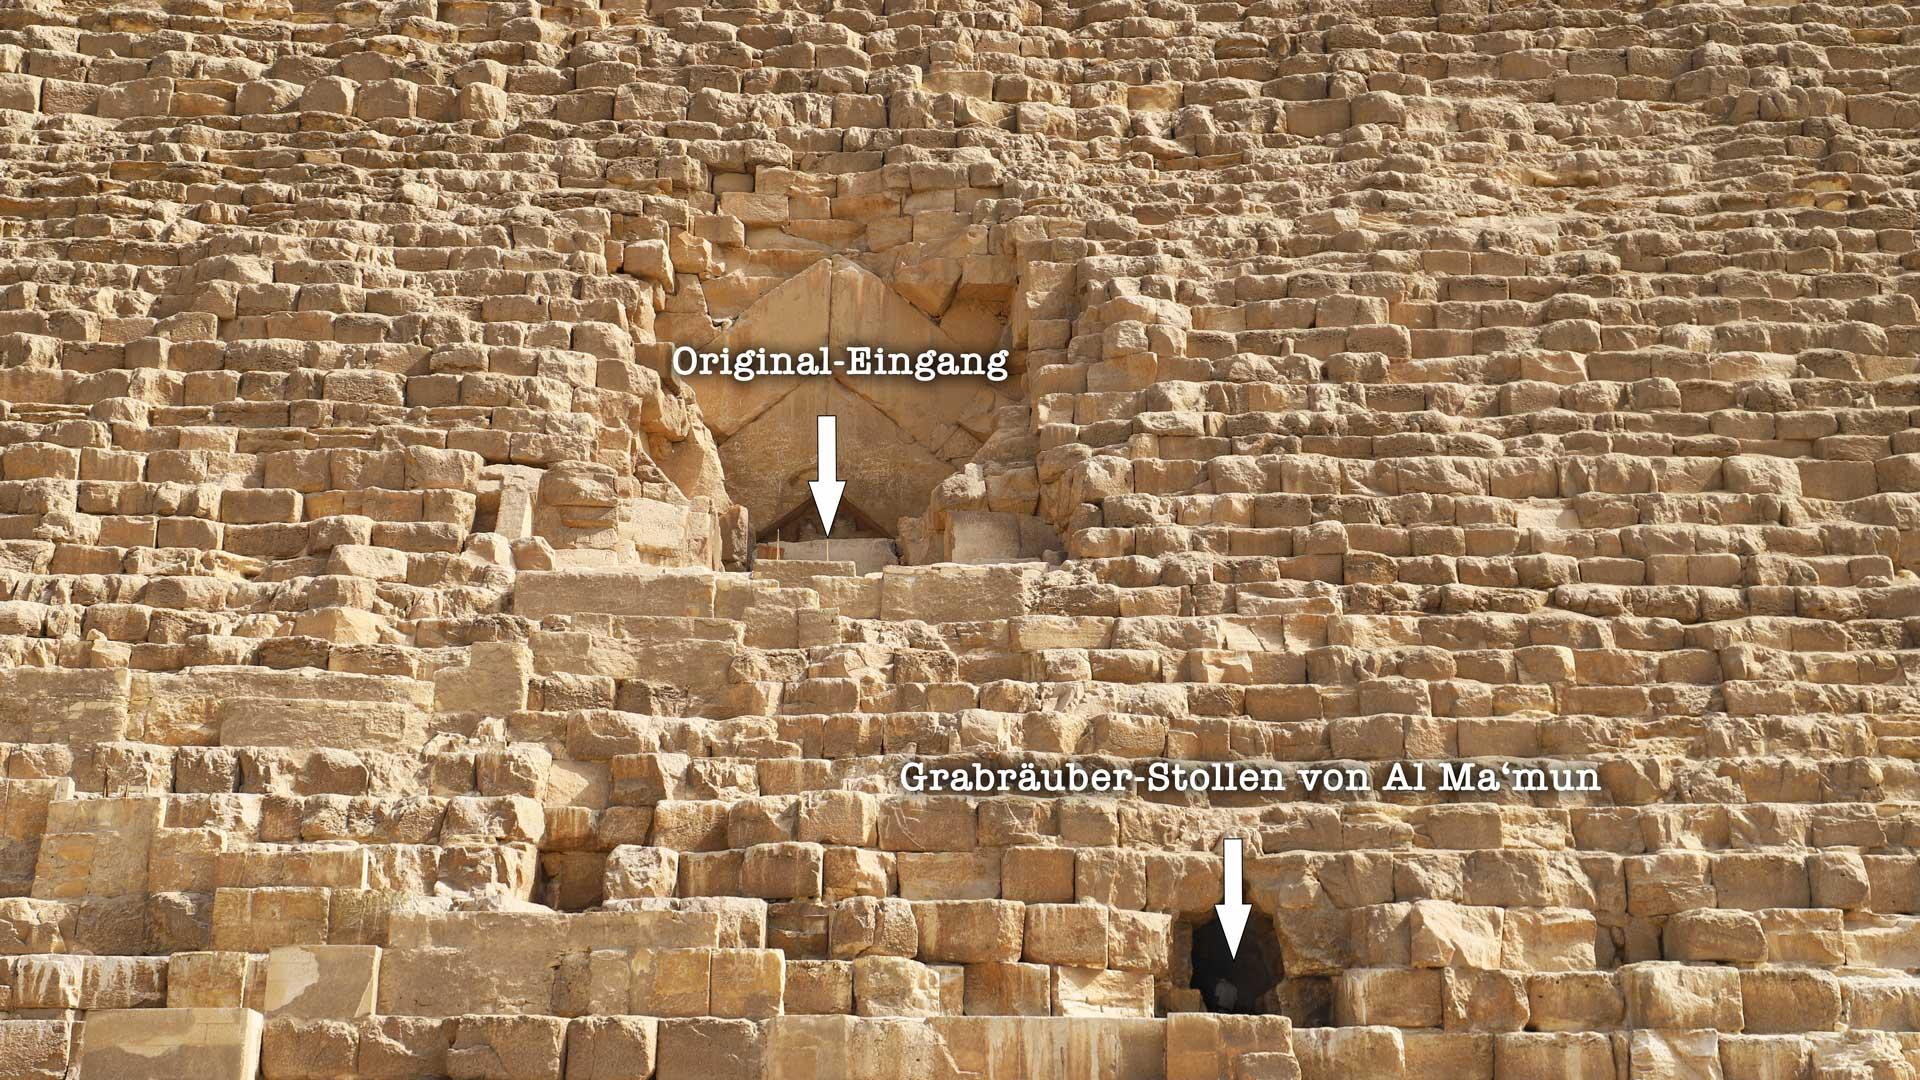 Original original entrance and the grave robber studs of Al-Ma'mun